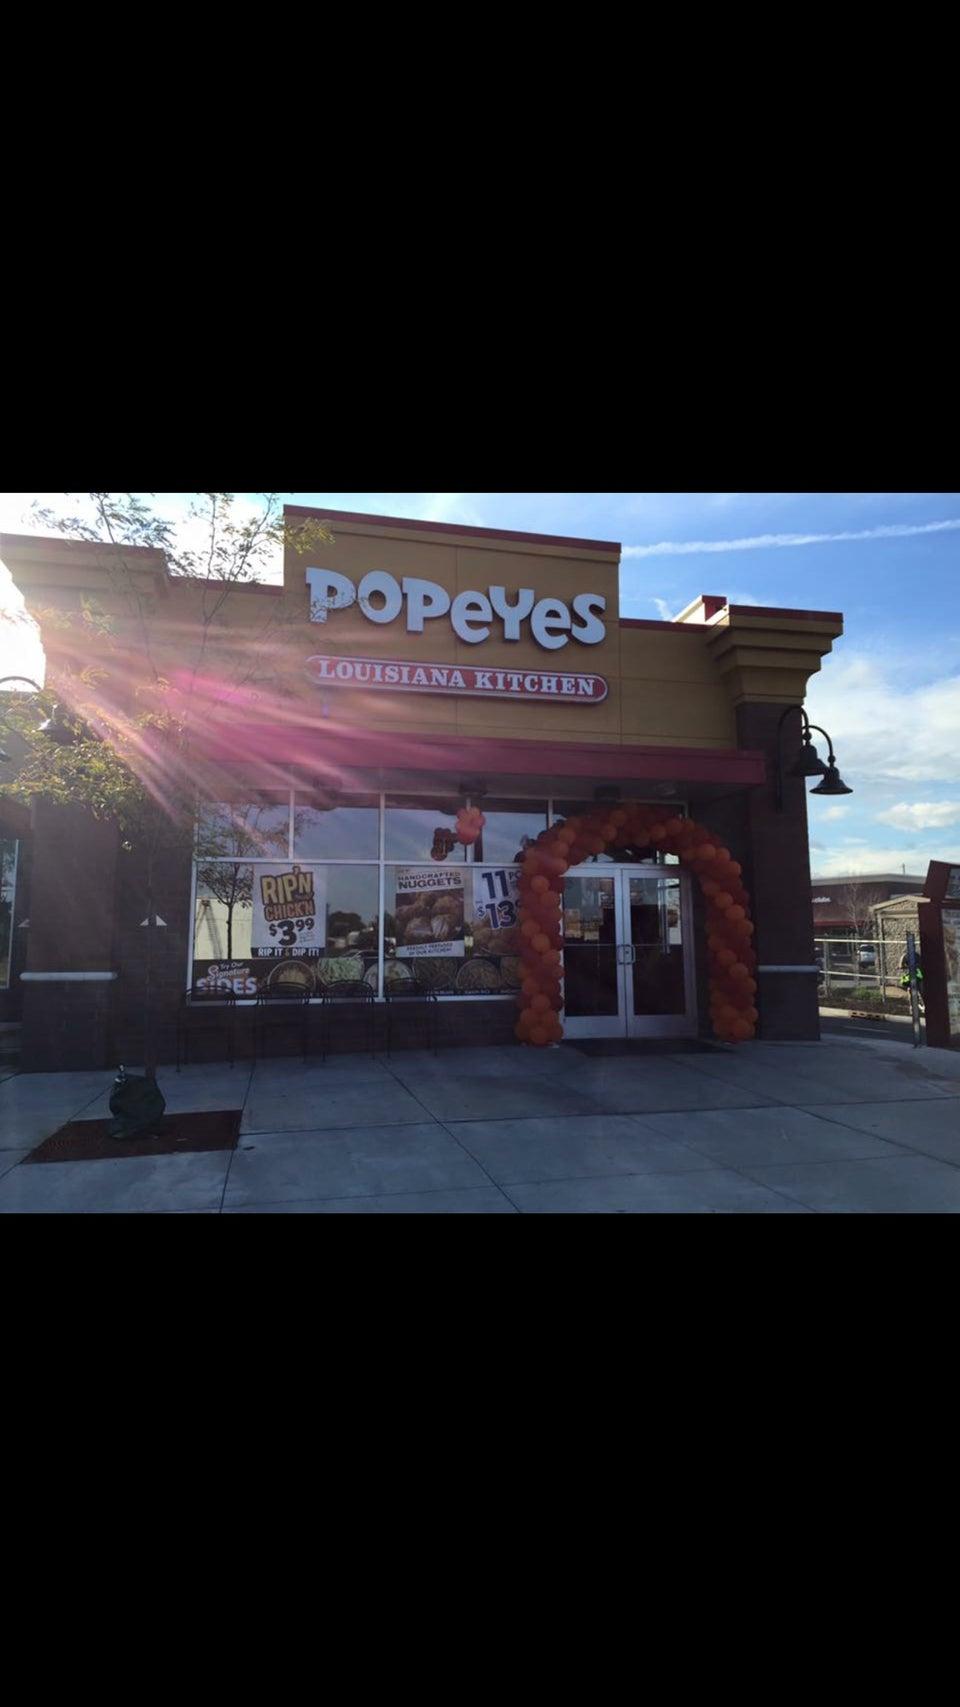 Popeyes Louisiana Kitchen 804 Bayonne Crossing Way, Bayonne